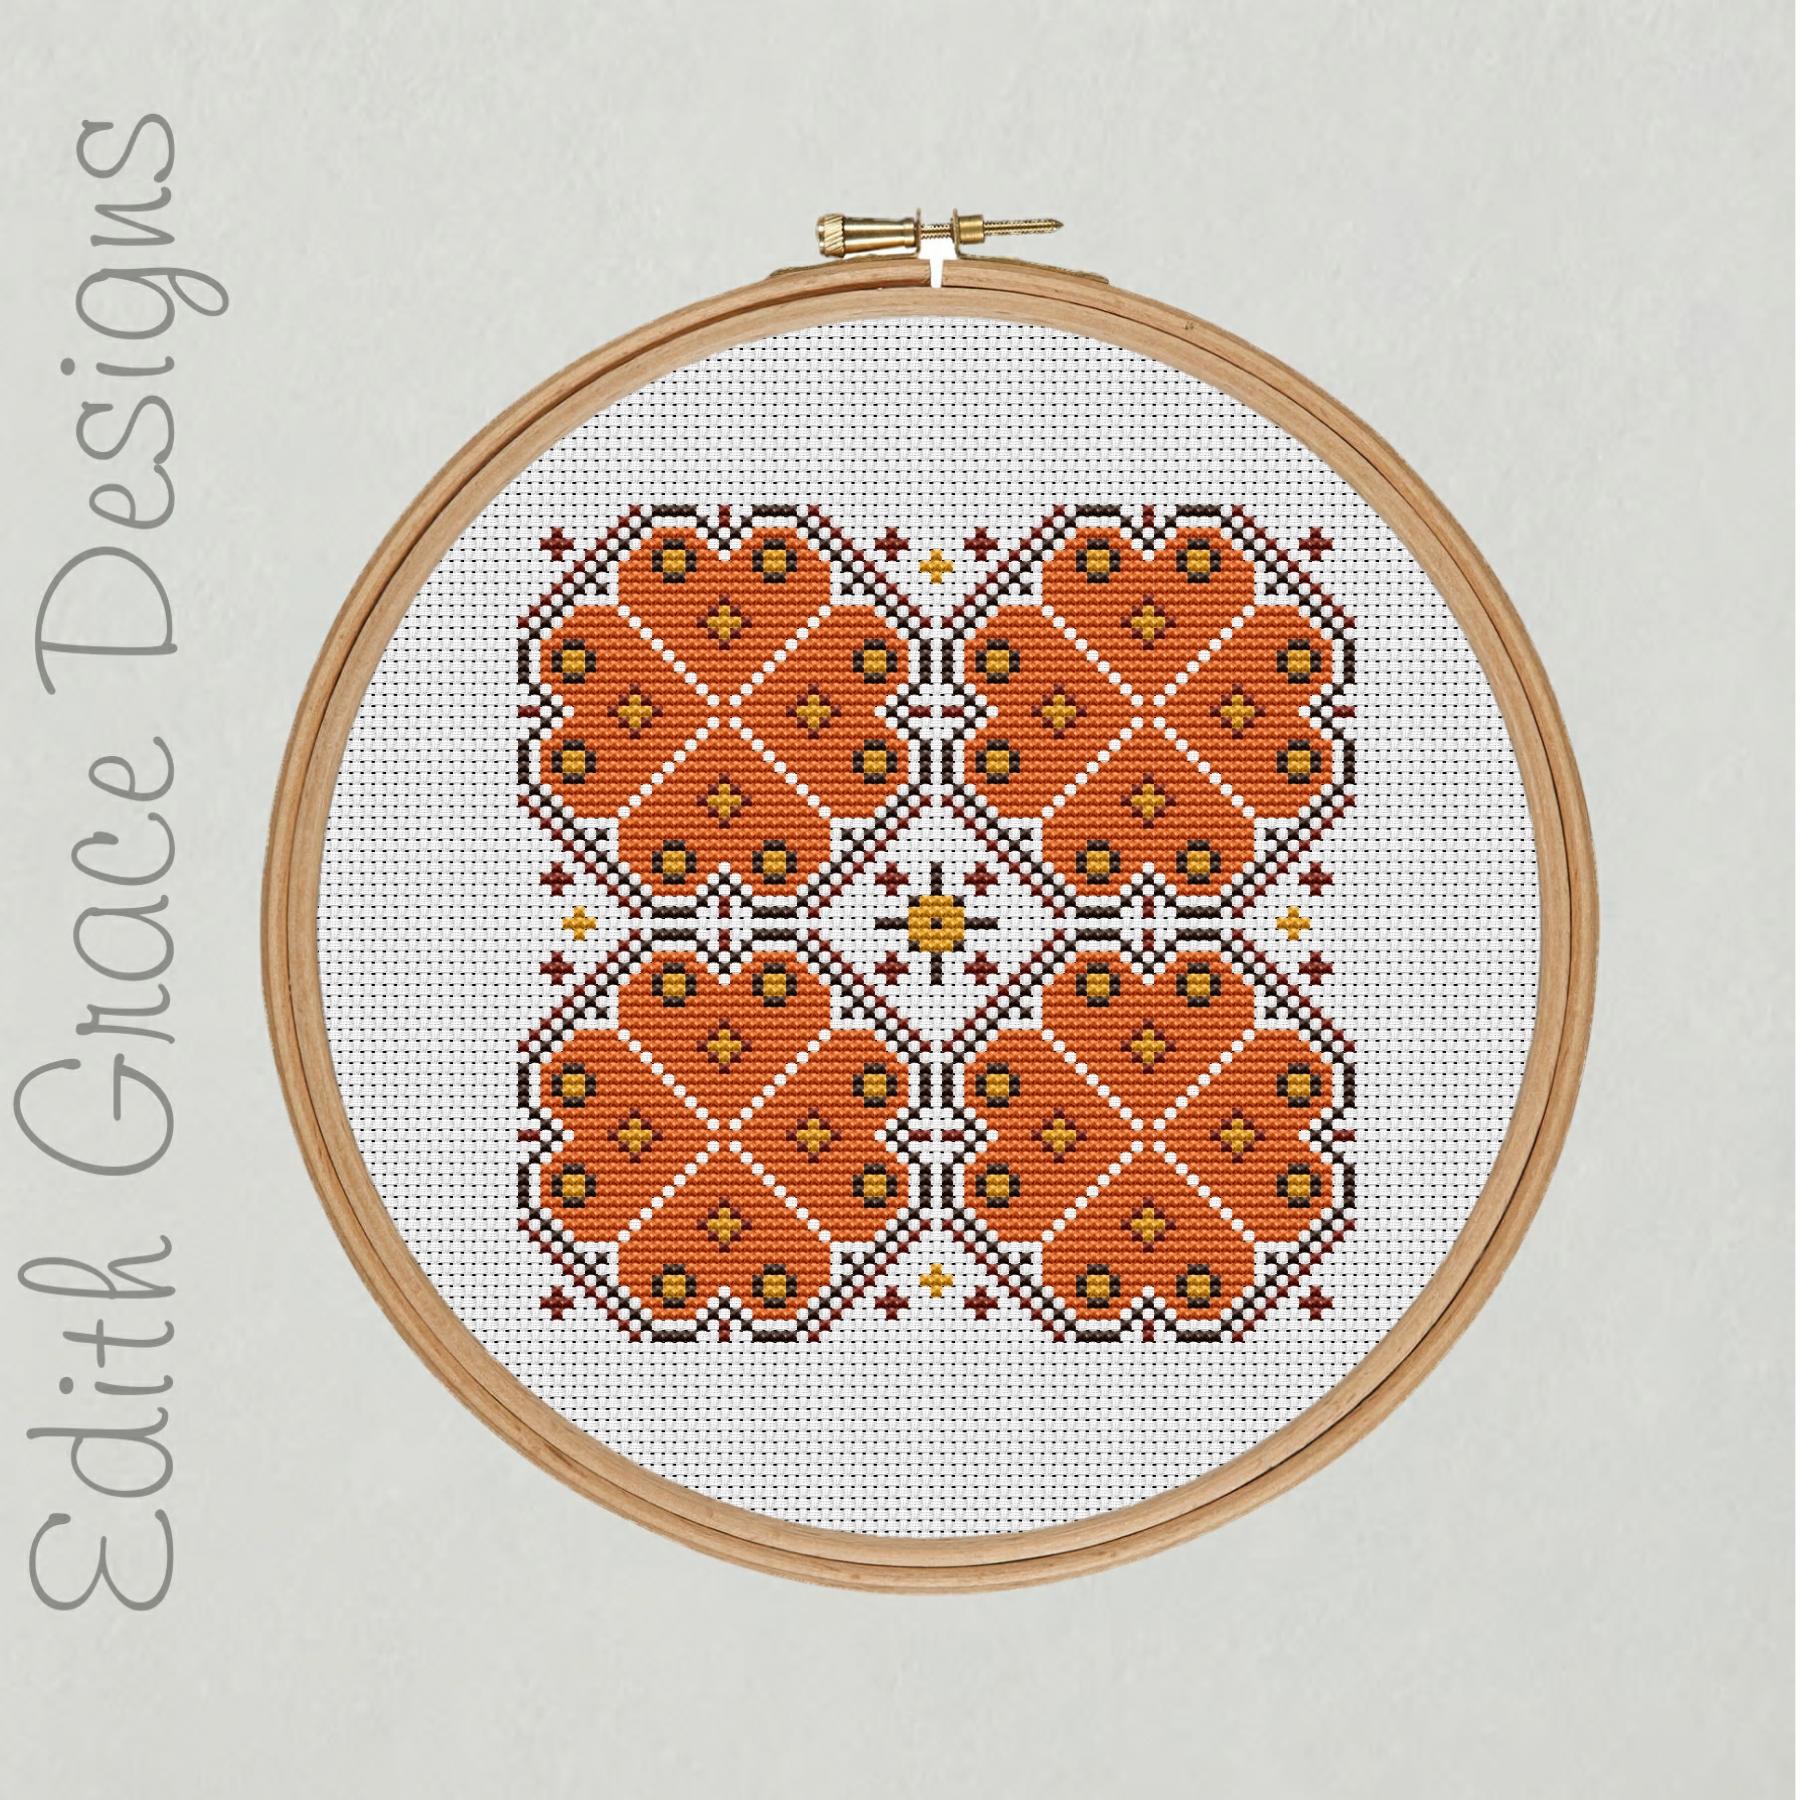 Autumn Geometric Embroidery